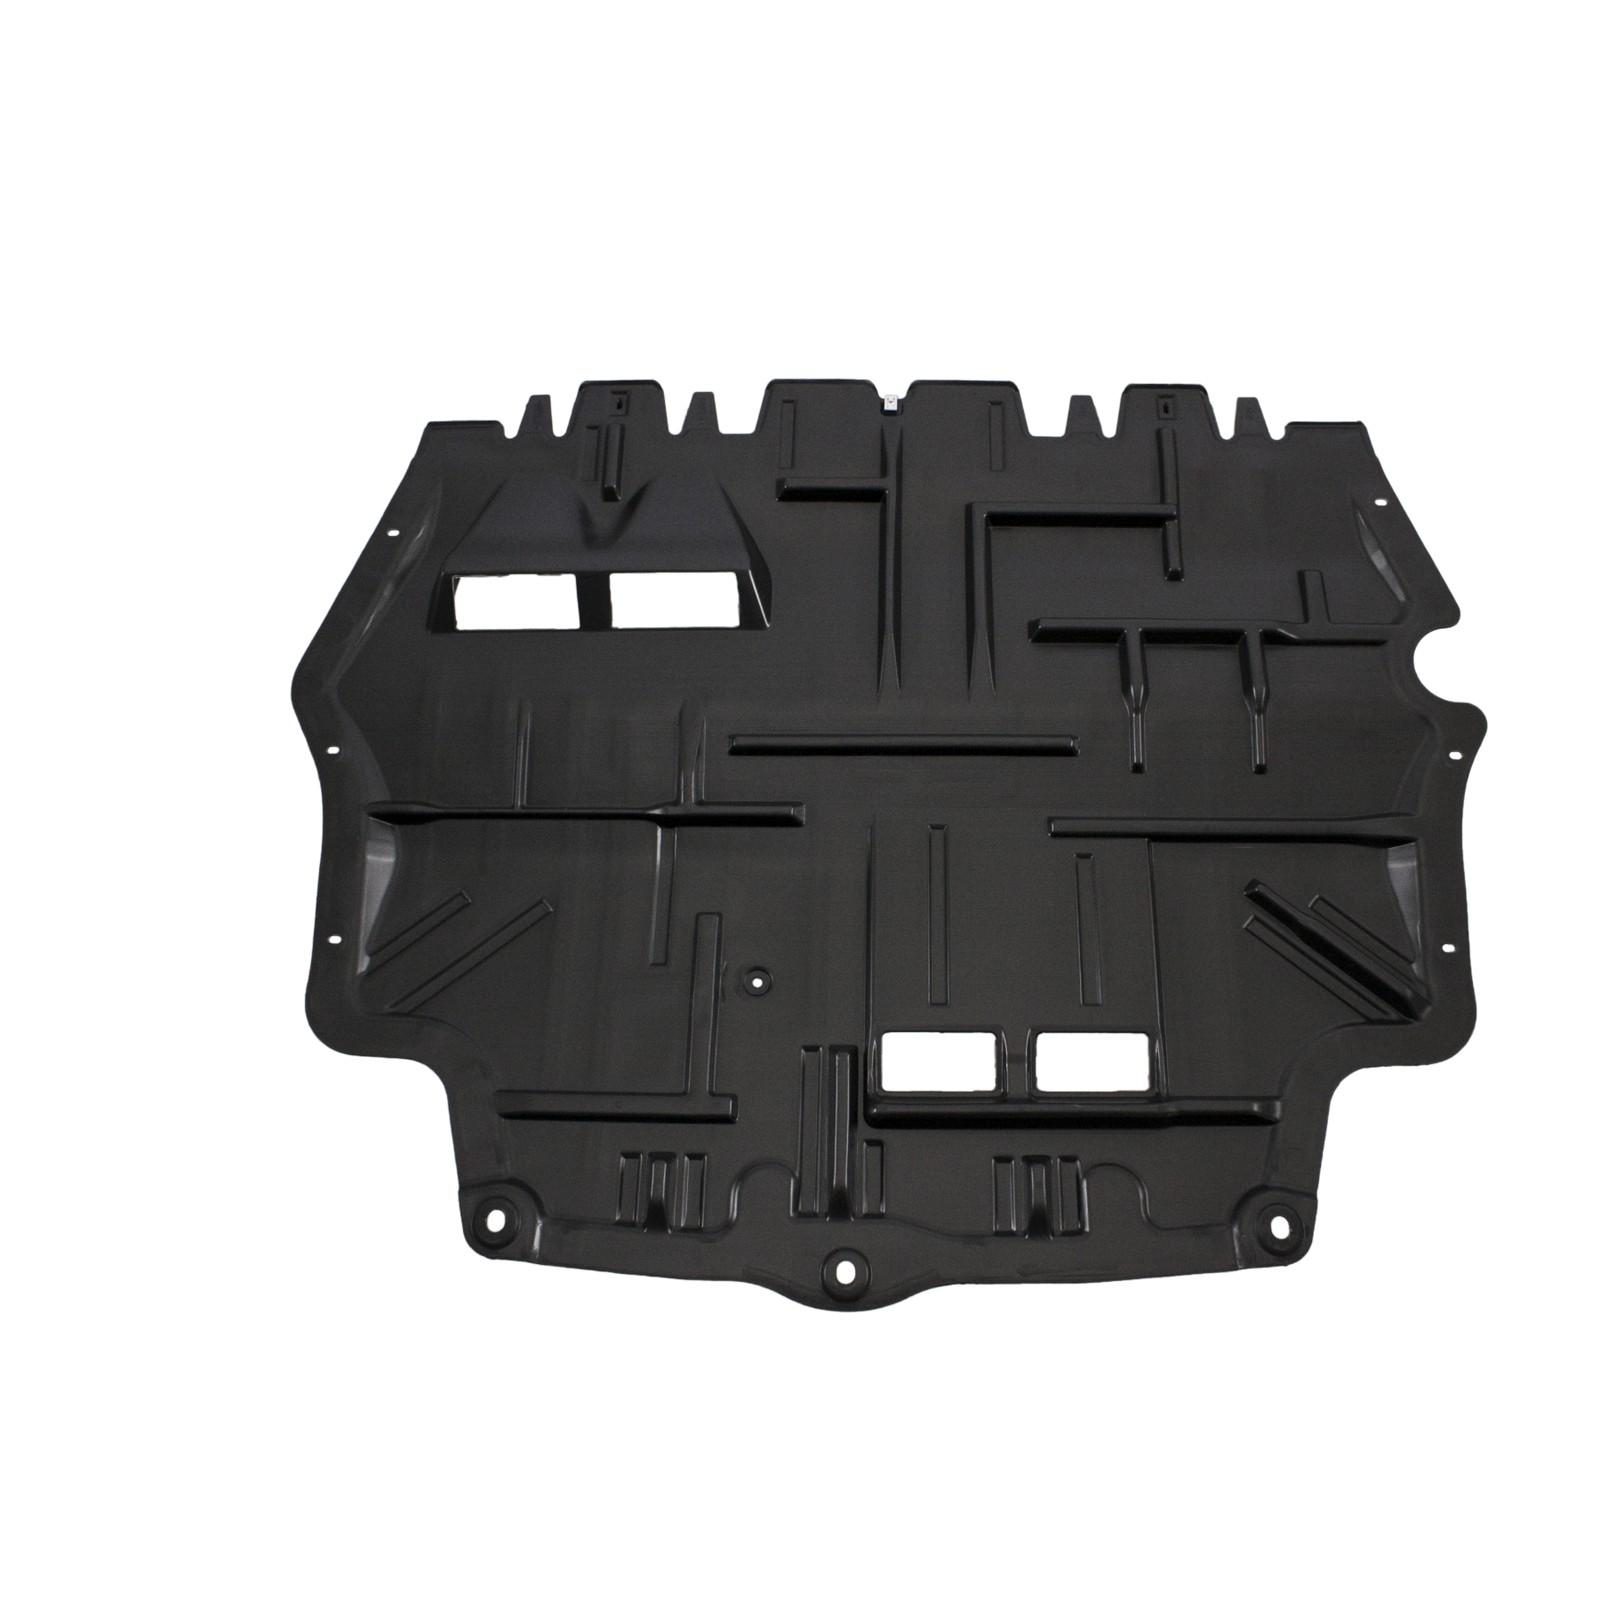 FEBI 33545 Unterfahrschutz Motorschutz VW Passat (3C2 3C5) CC (357) 2.0/3.2 FSI 3.6 R36